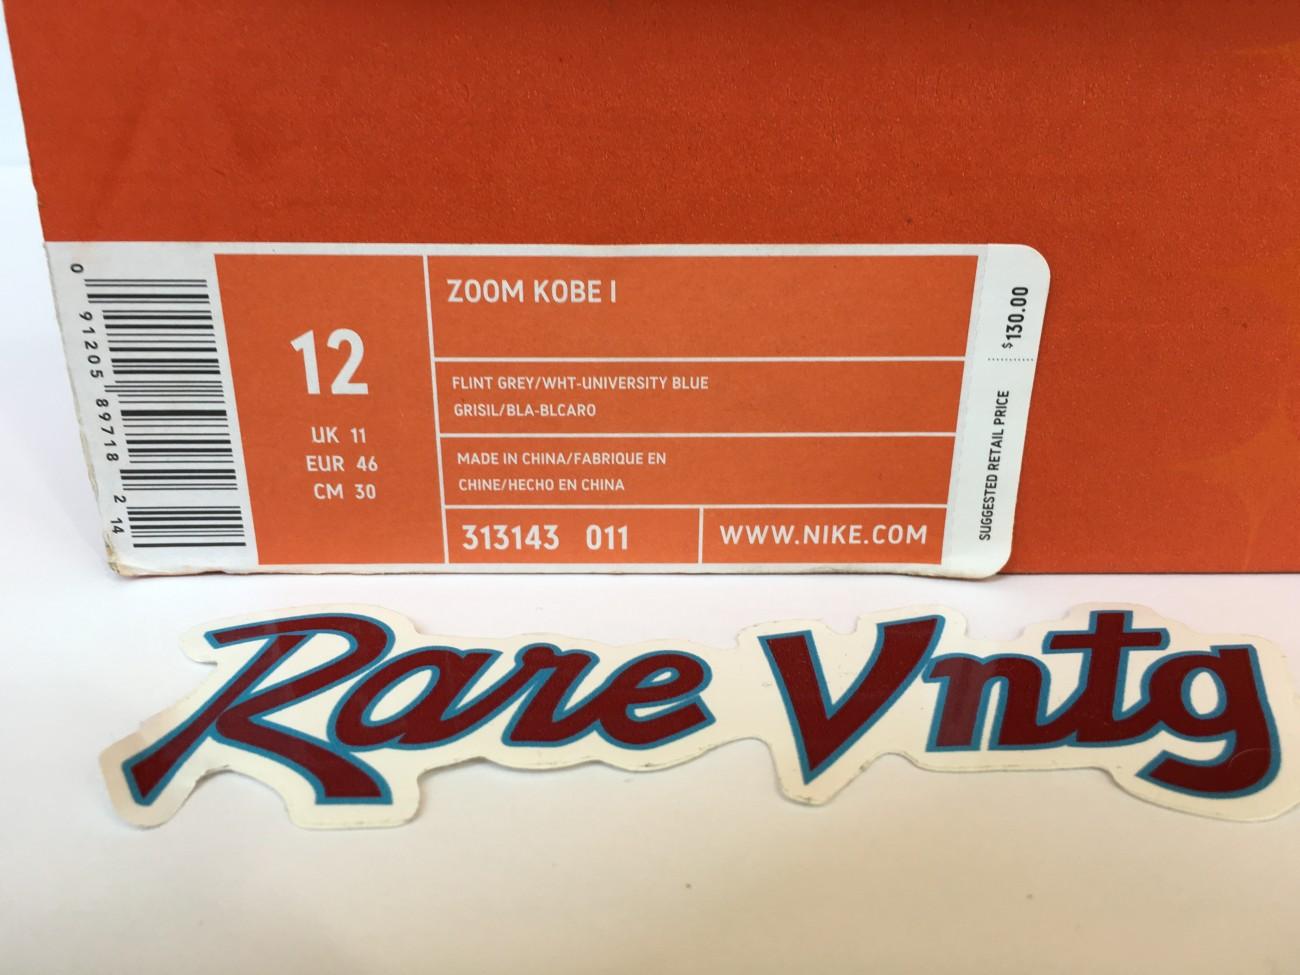 9684d140b4f2 Deadstock nike Kobe 1 sneakers size 12. Nike Zoom Kobe 1 OG MPLS ...